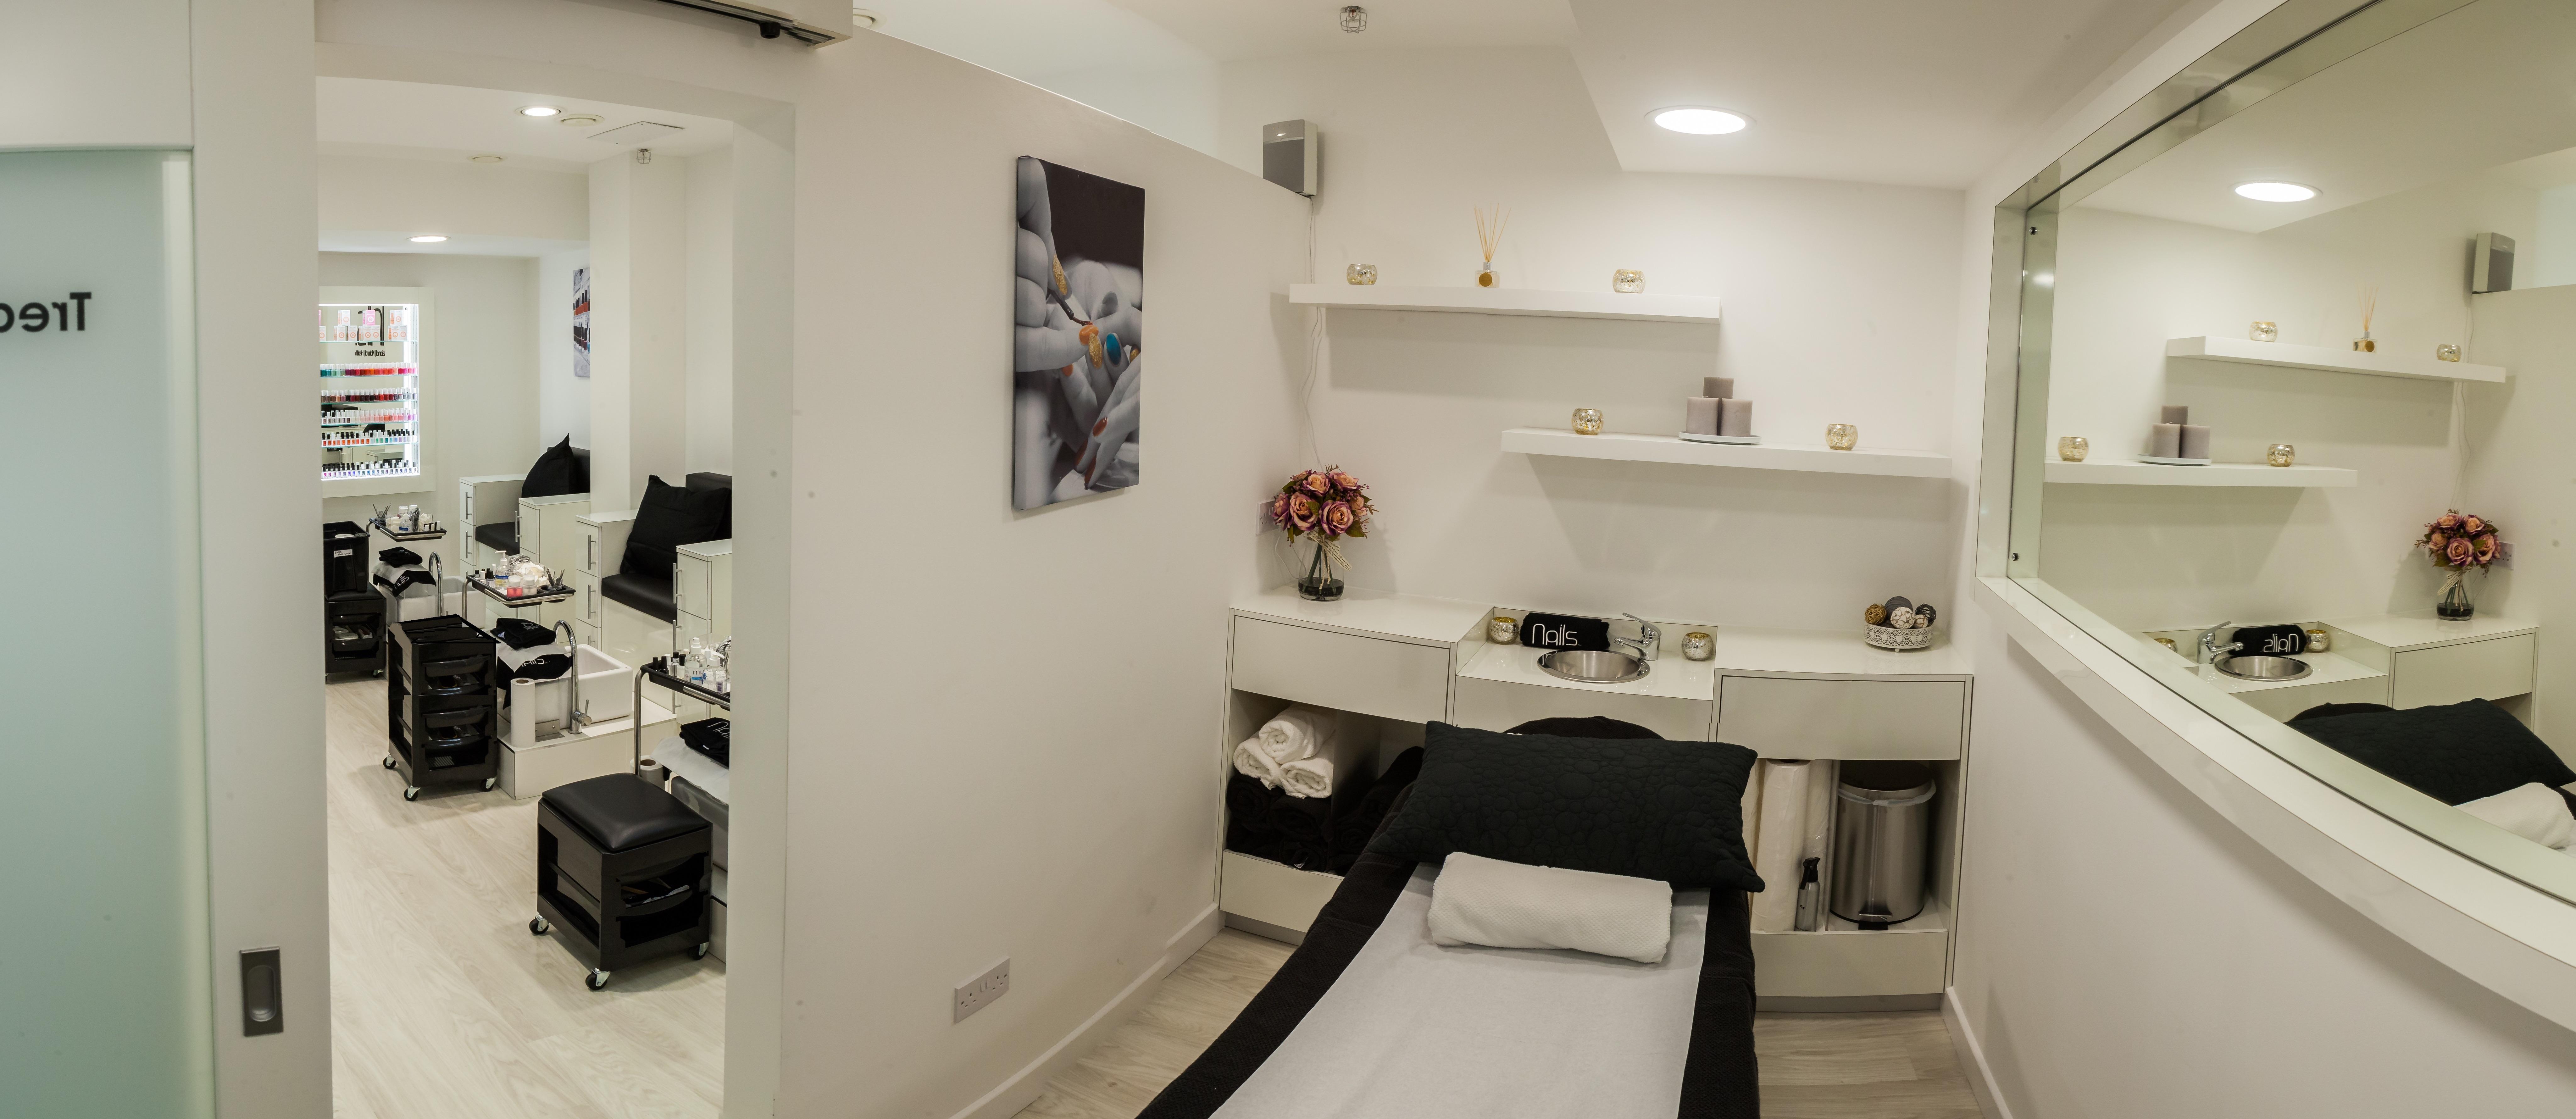 Free Images Room Interior Design Hospital Clinic